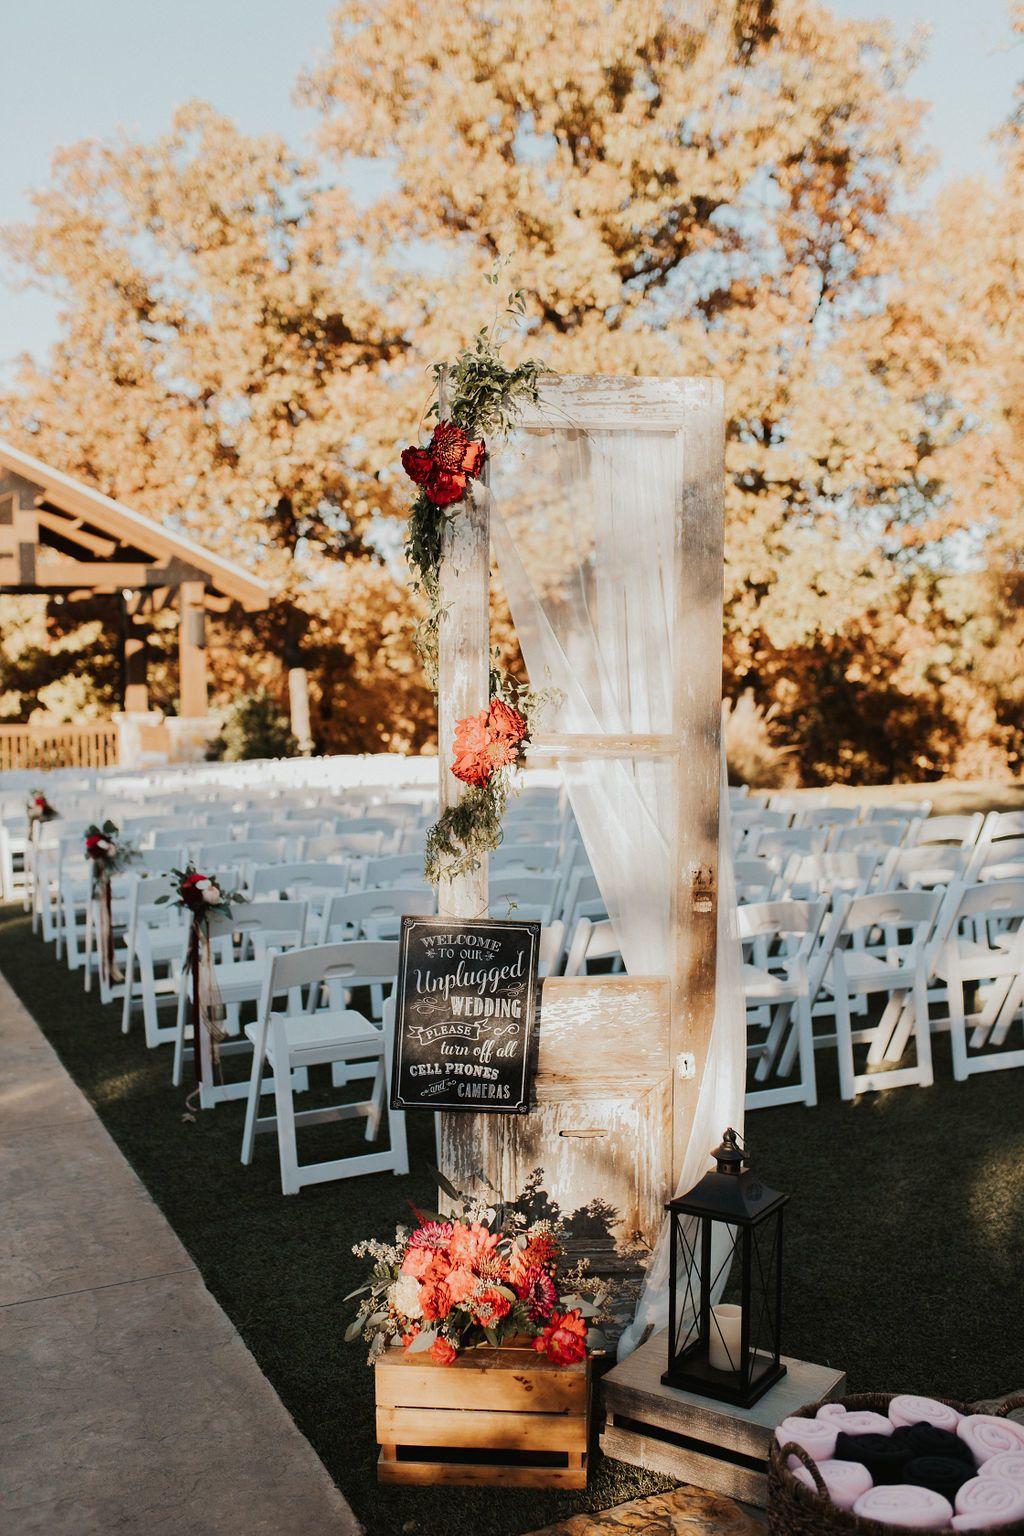 Wedding Venue Tulsa Oklahoma Outdoor Wedding Flowers Rustic